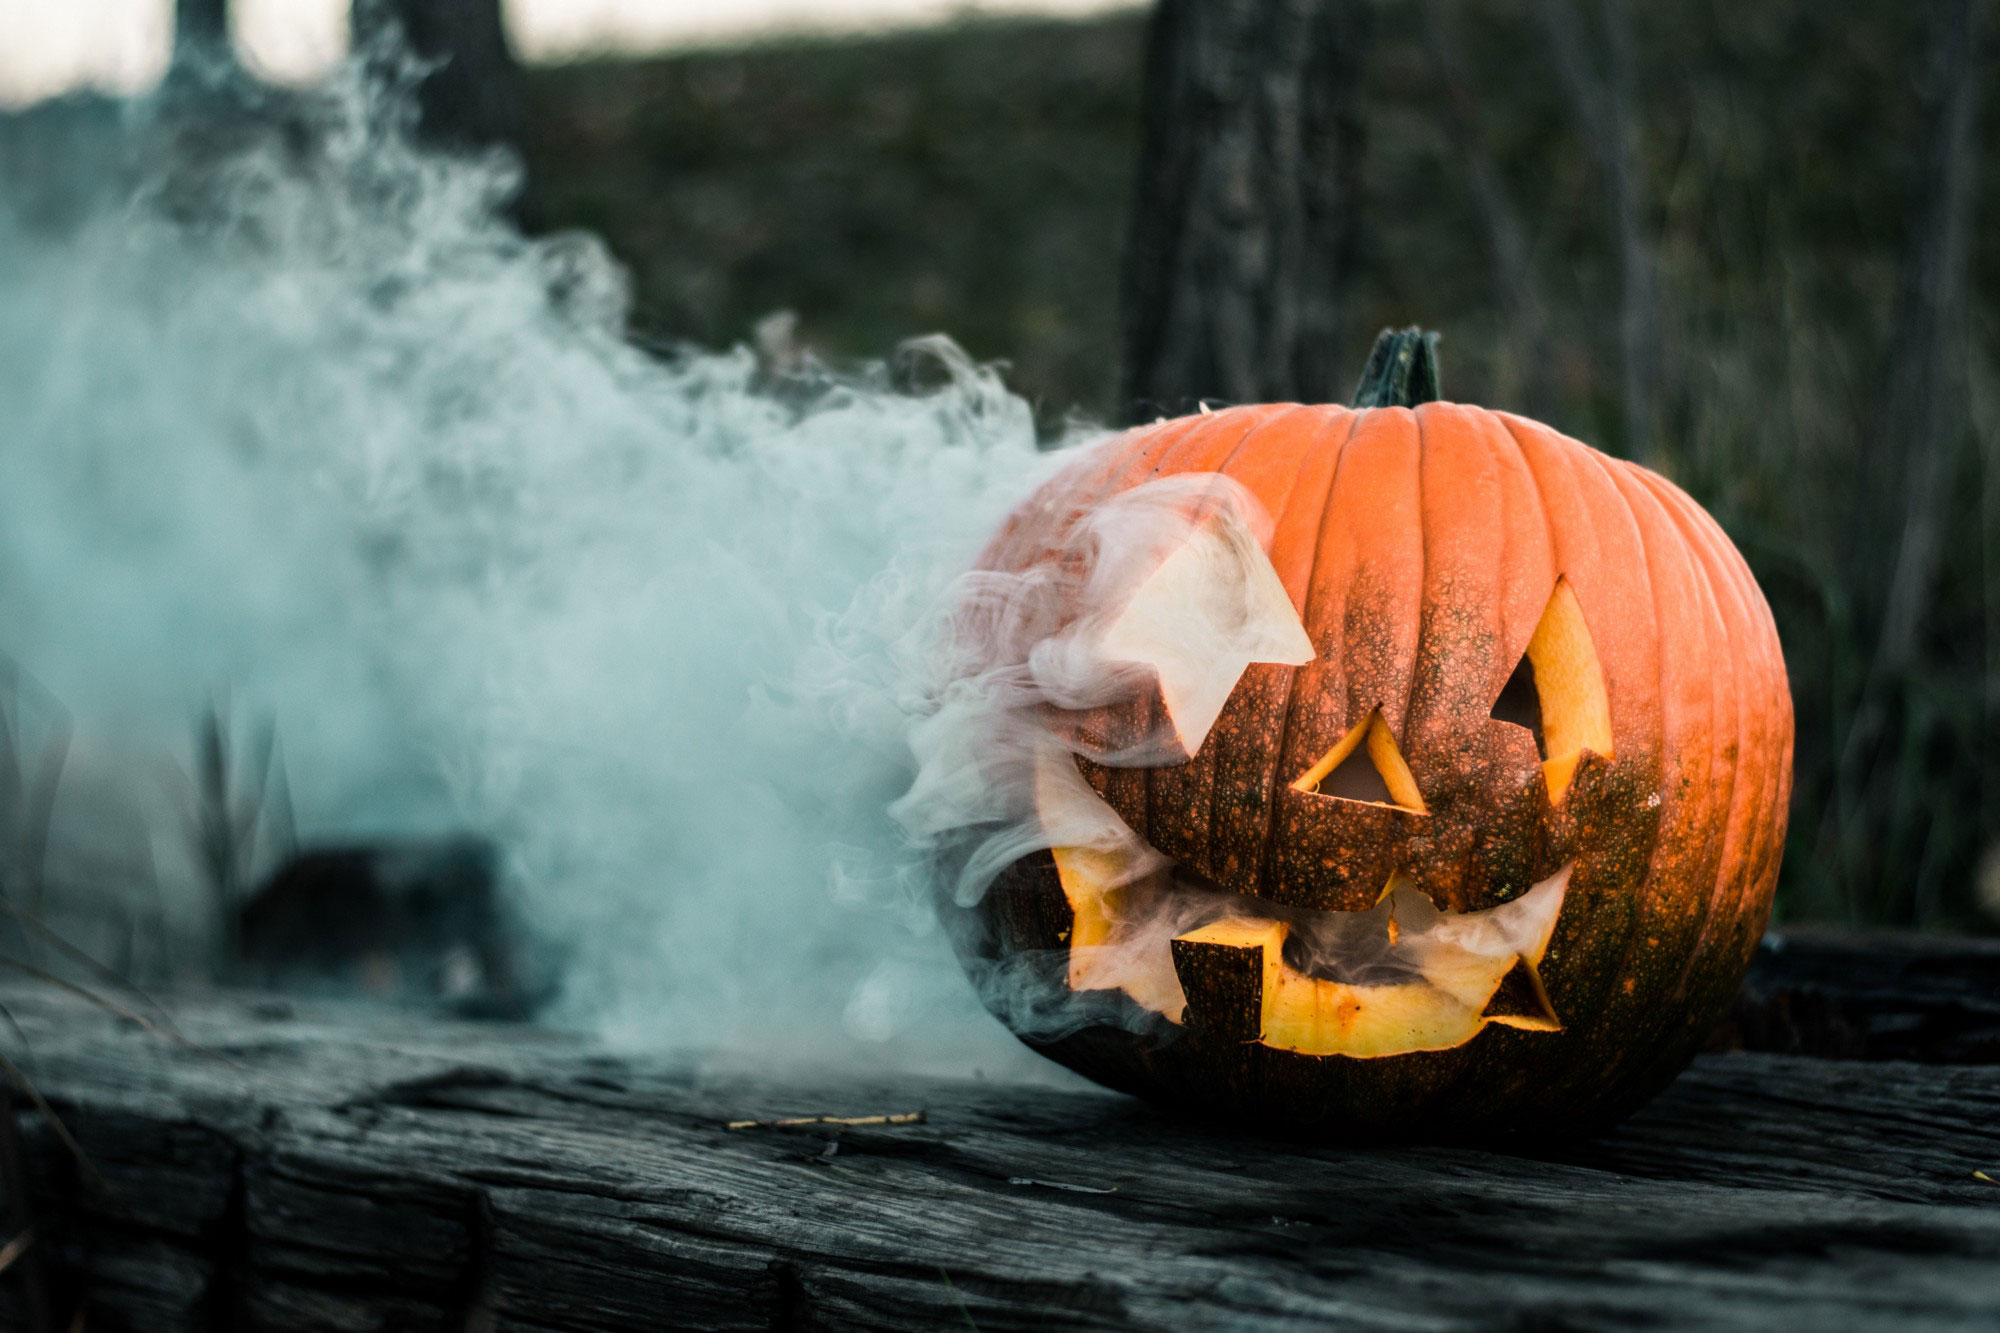 a jack-o-lantern with smoke coming out